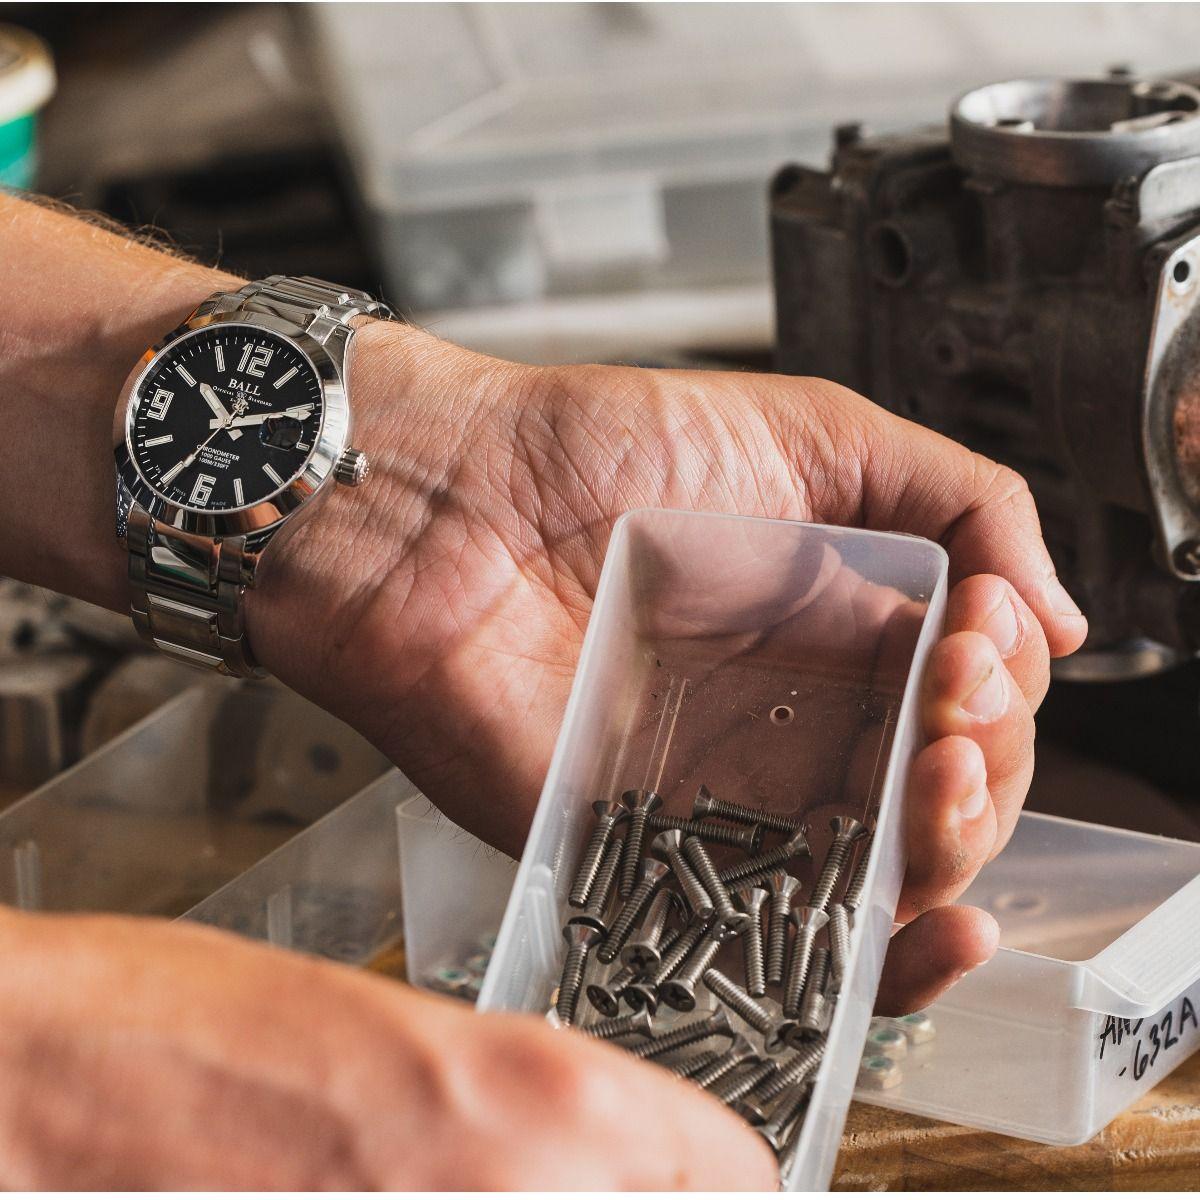 Ball Engineer III Pioneer Automatic Chronometer Men's Watch